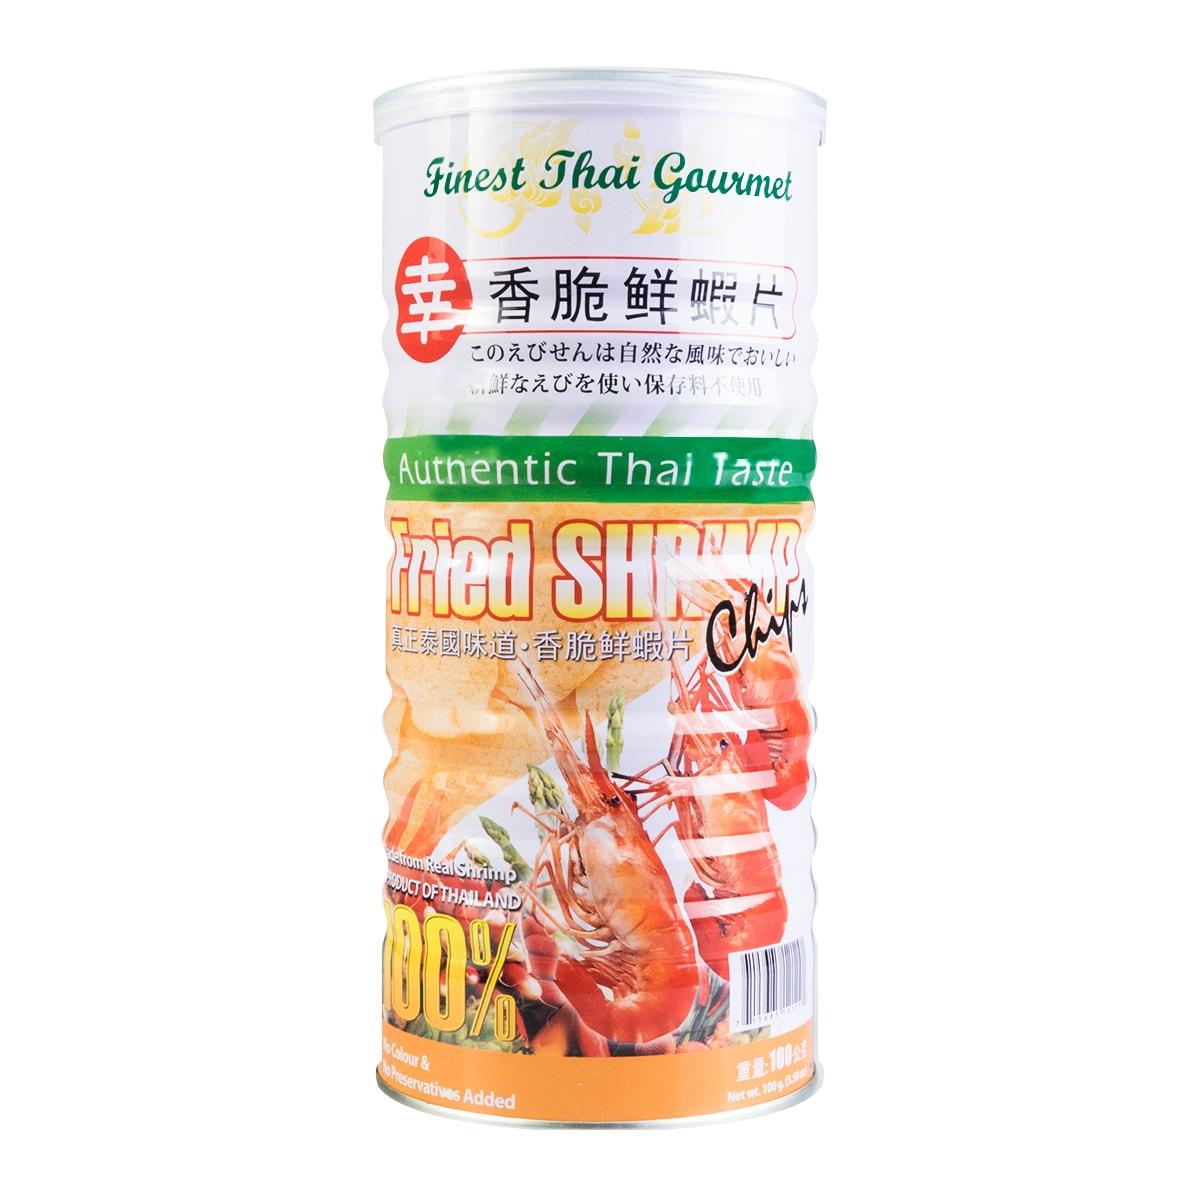 RICHI Authentic Thai Taste Fried Shrimp Chip 100g